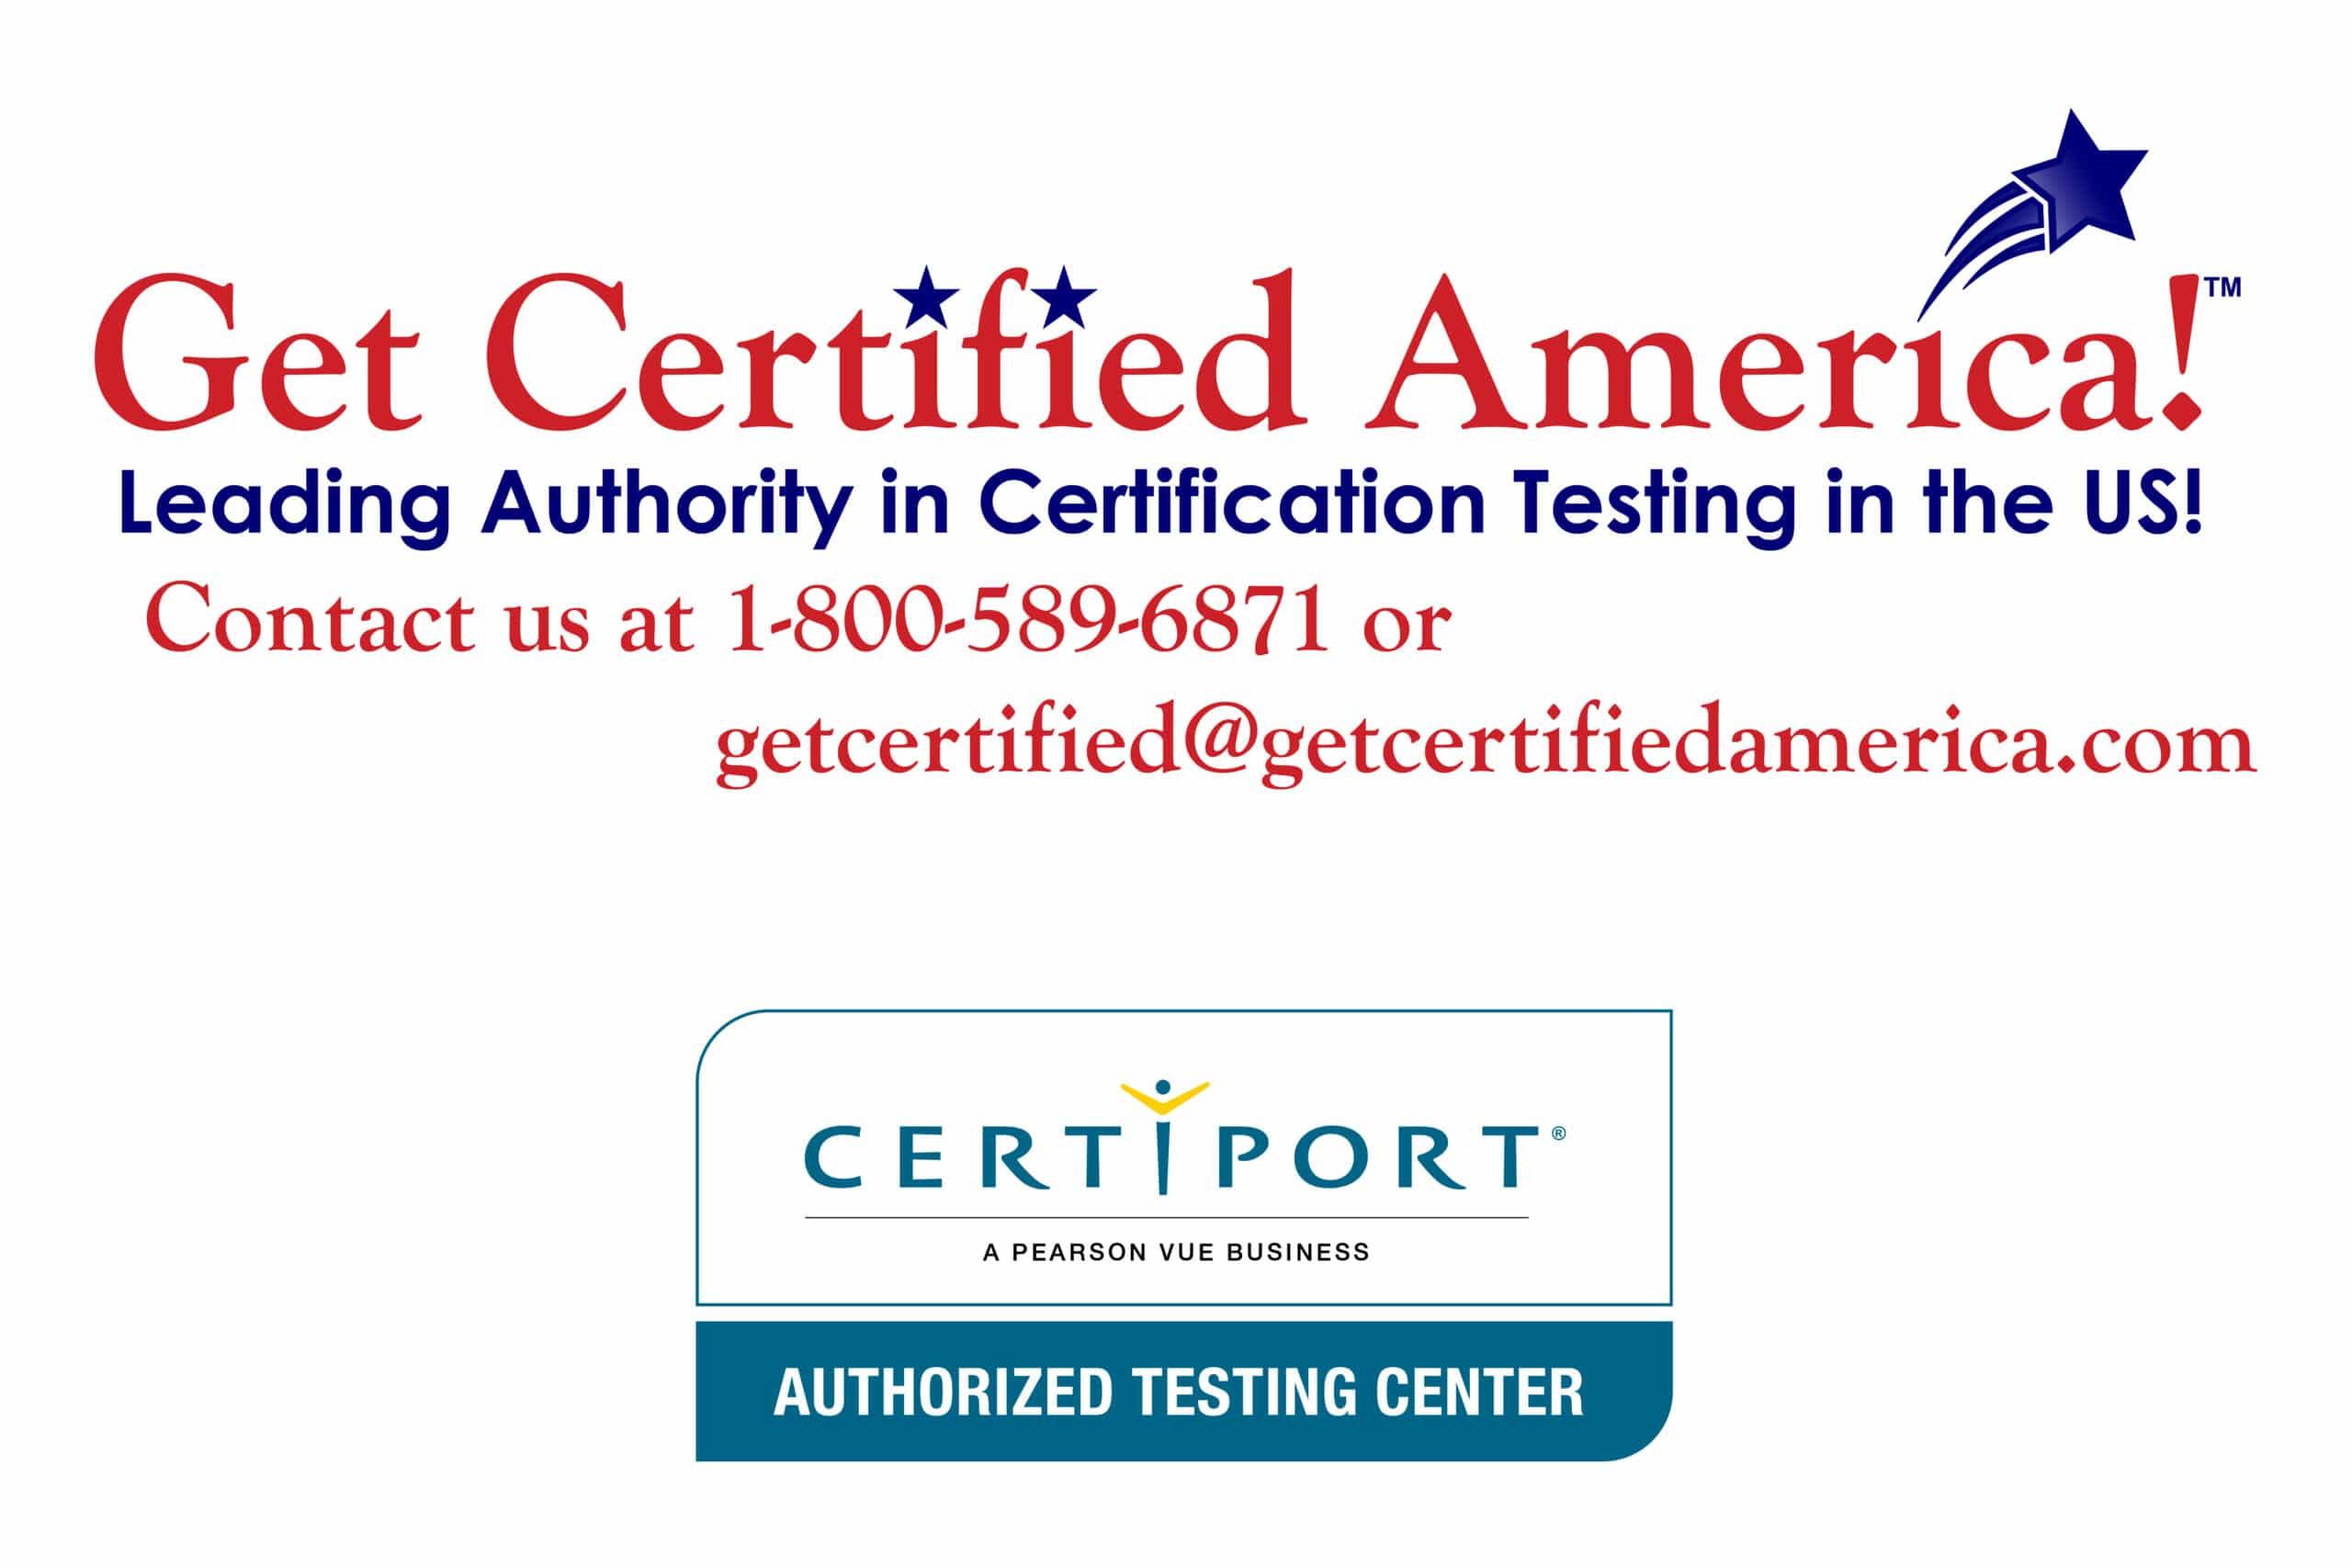 Get Certified America!